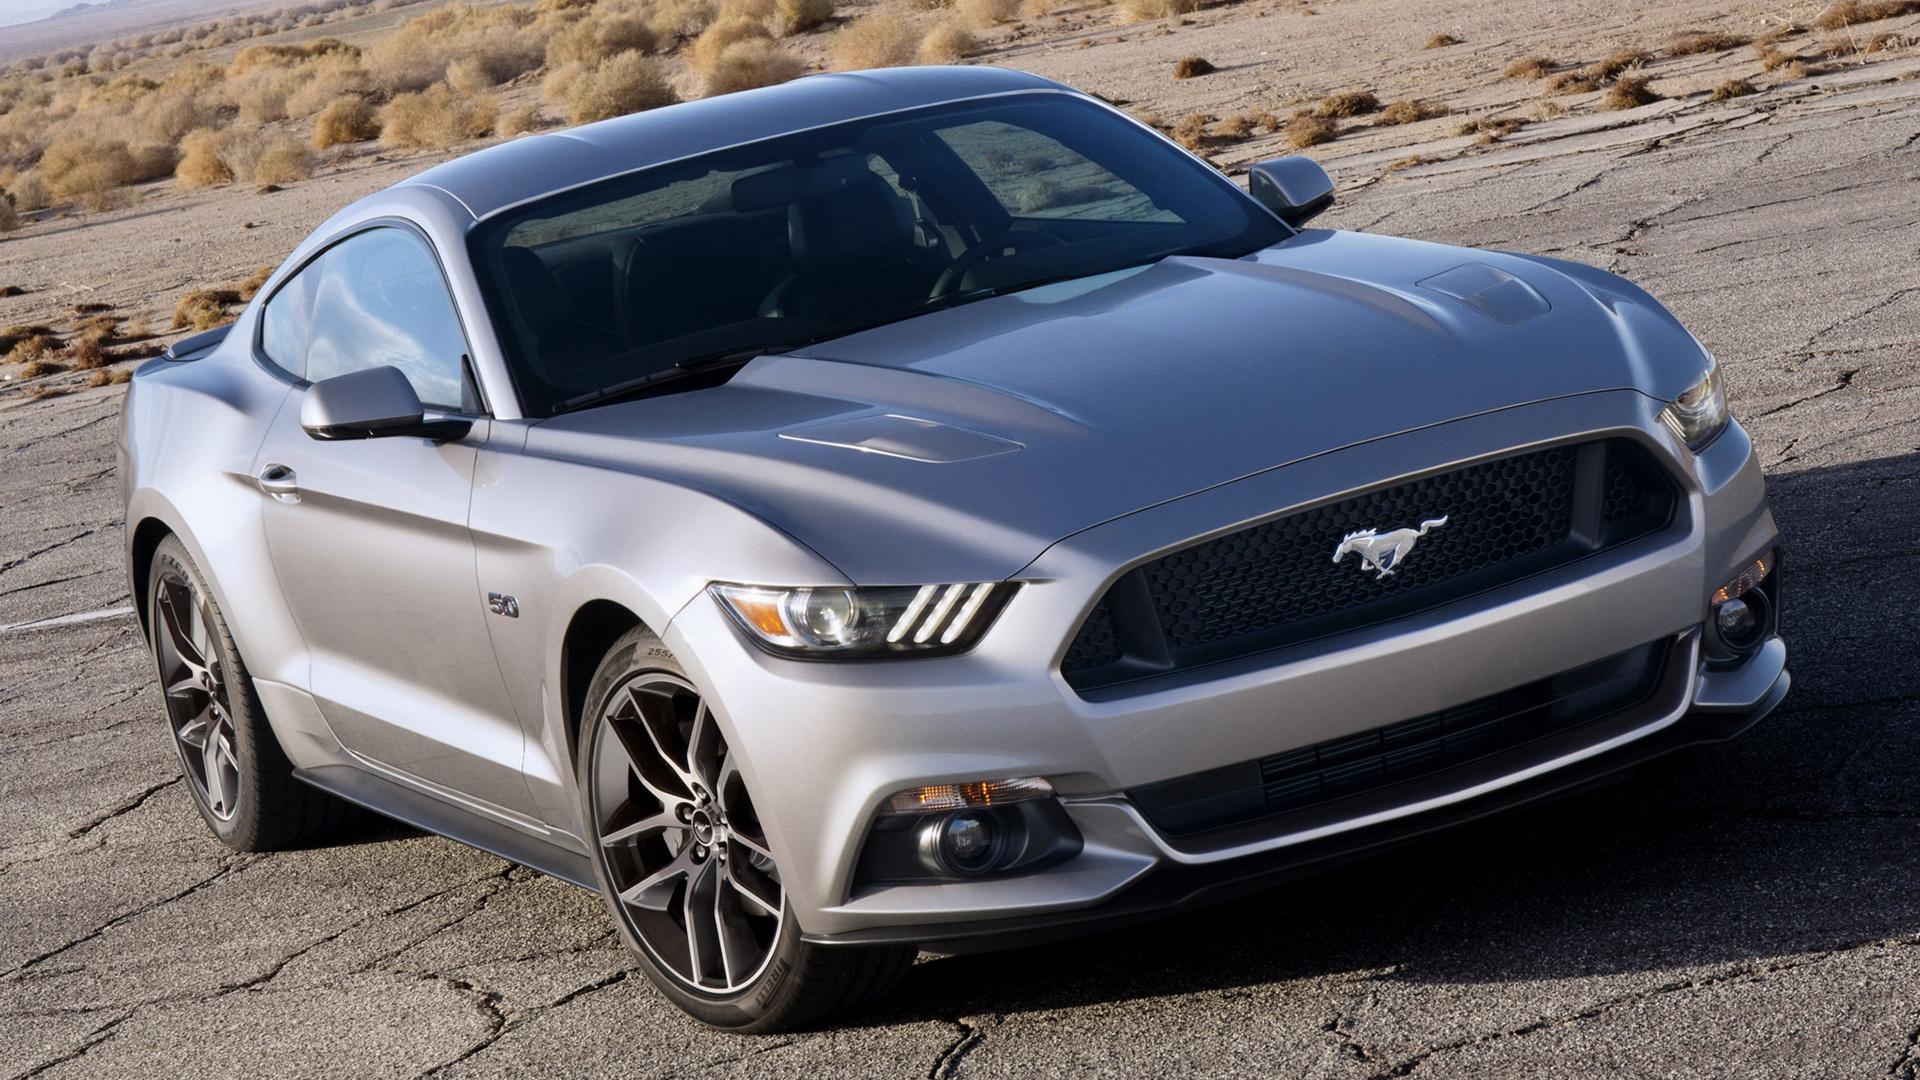 2015 Mustang Gt Wallpaper 1920x1080